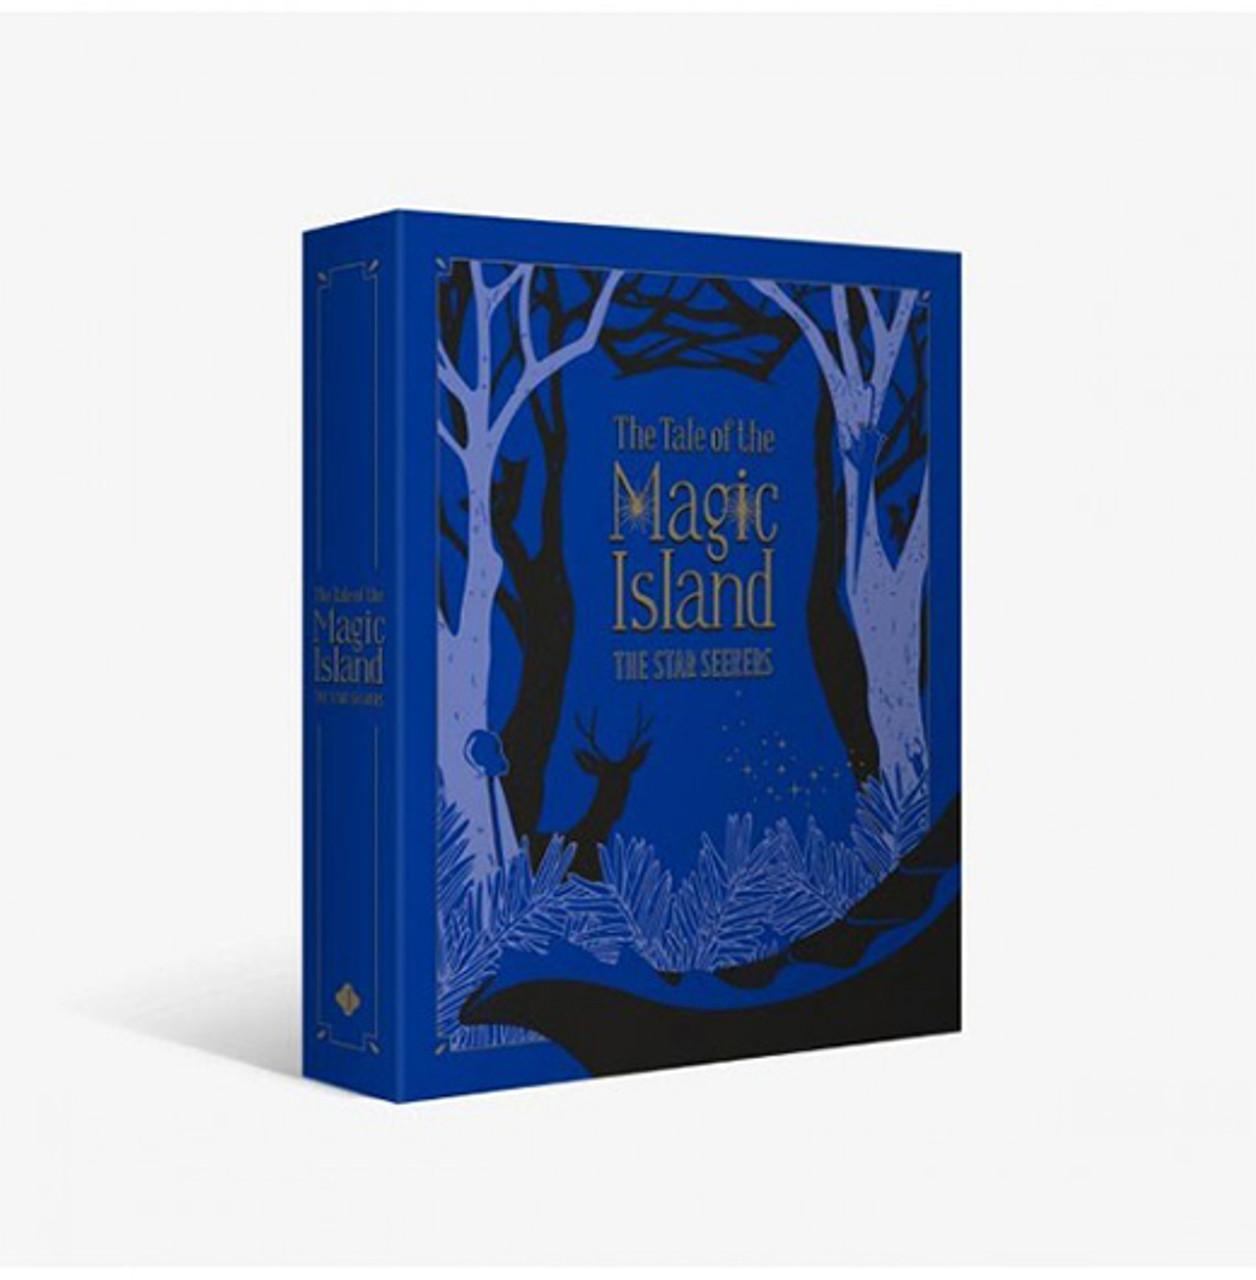 TXT - The Tale of the Magic Island: THE STAR SEEKER (J)